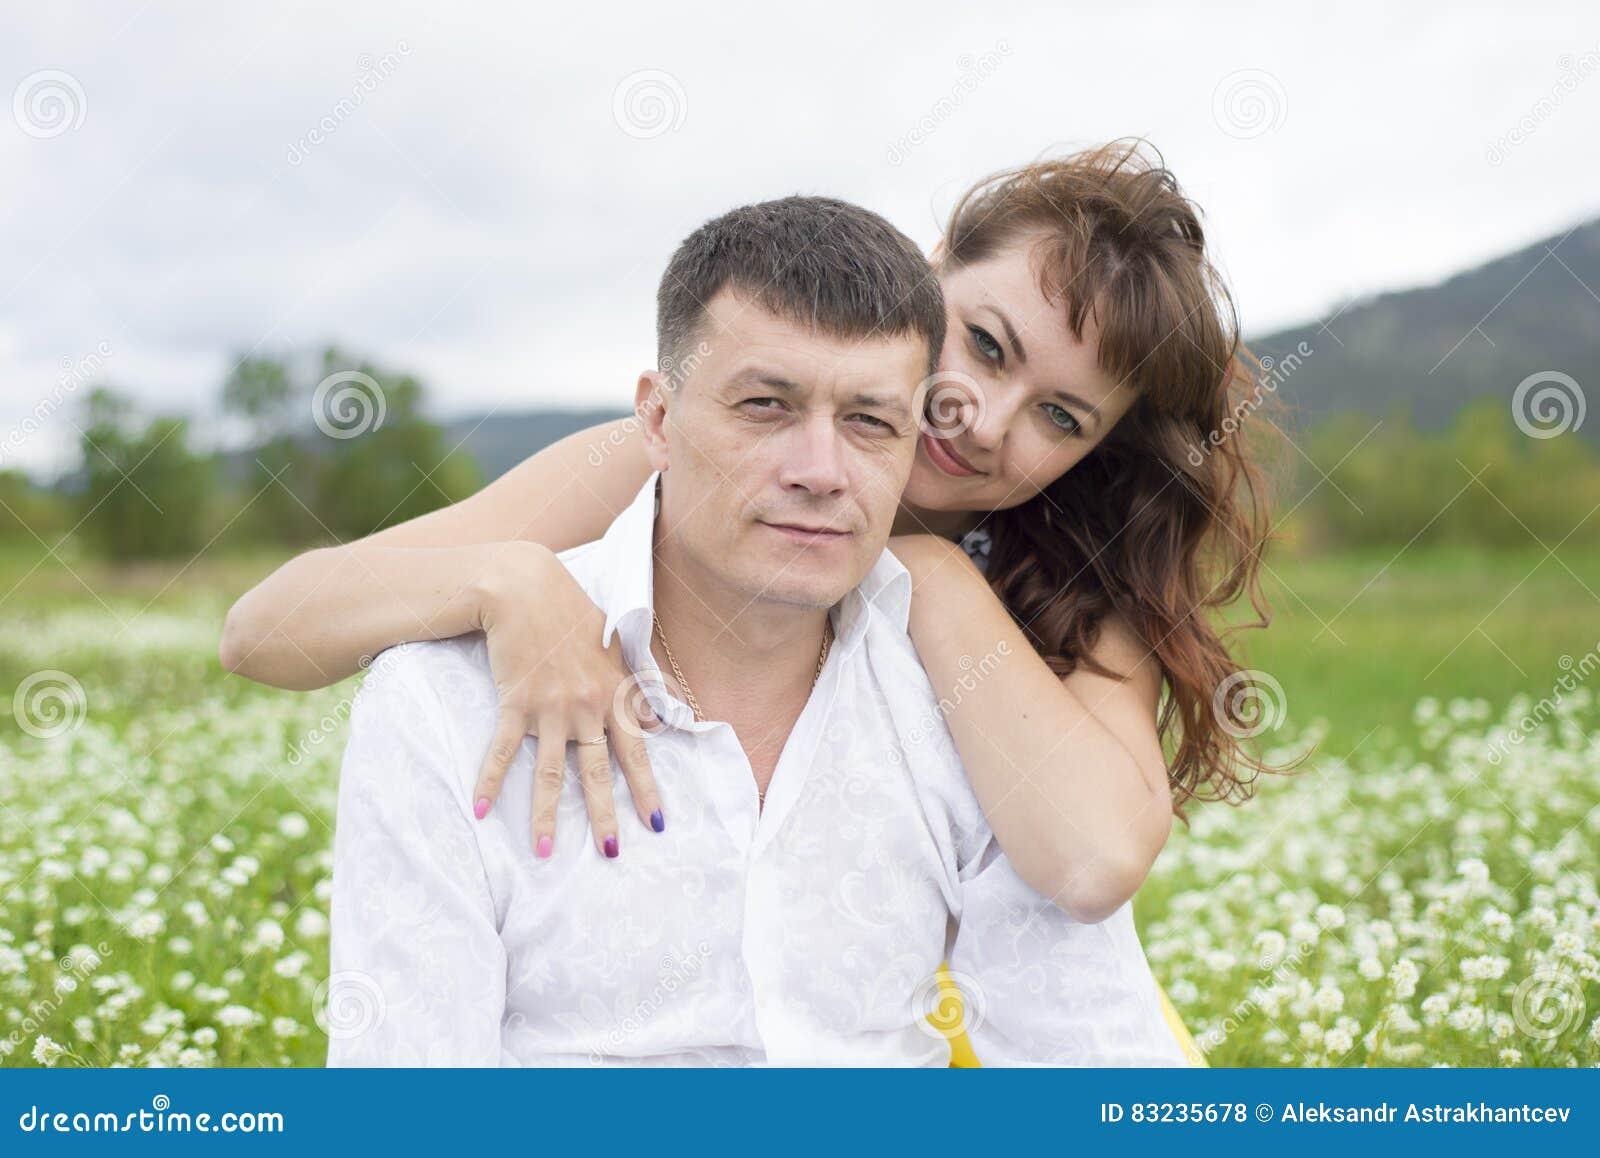 Cyber dating initiated synonym